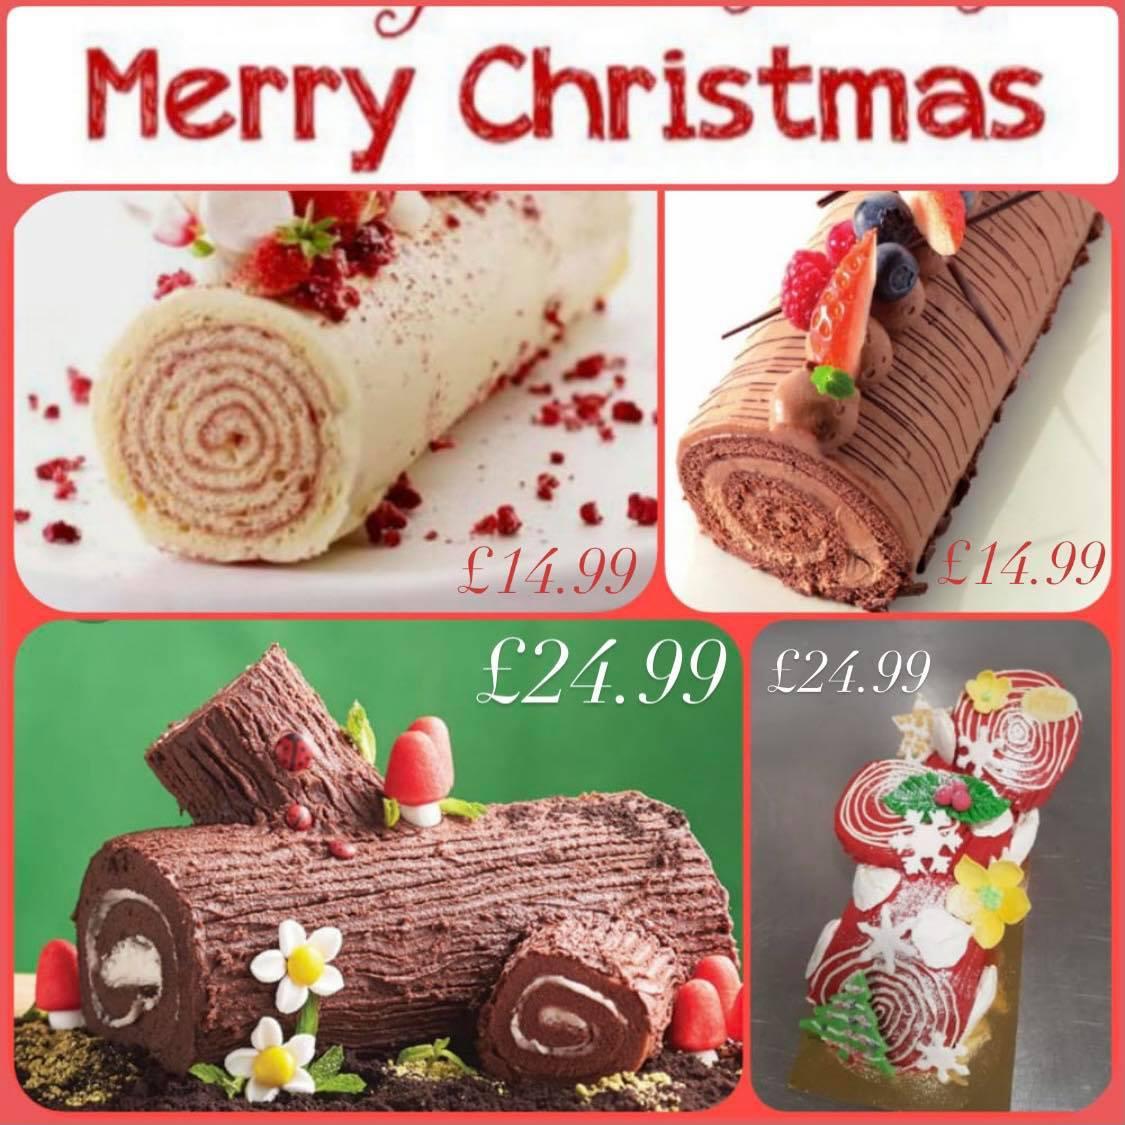 Merry Christmas-131220